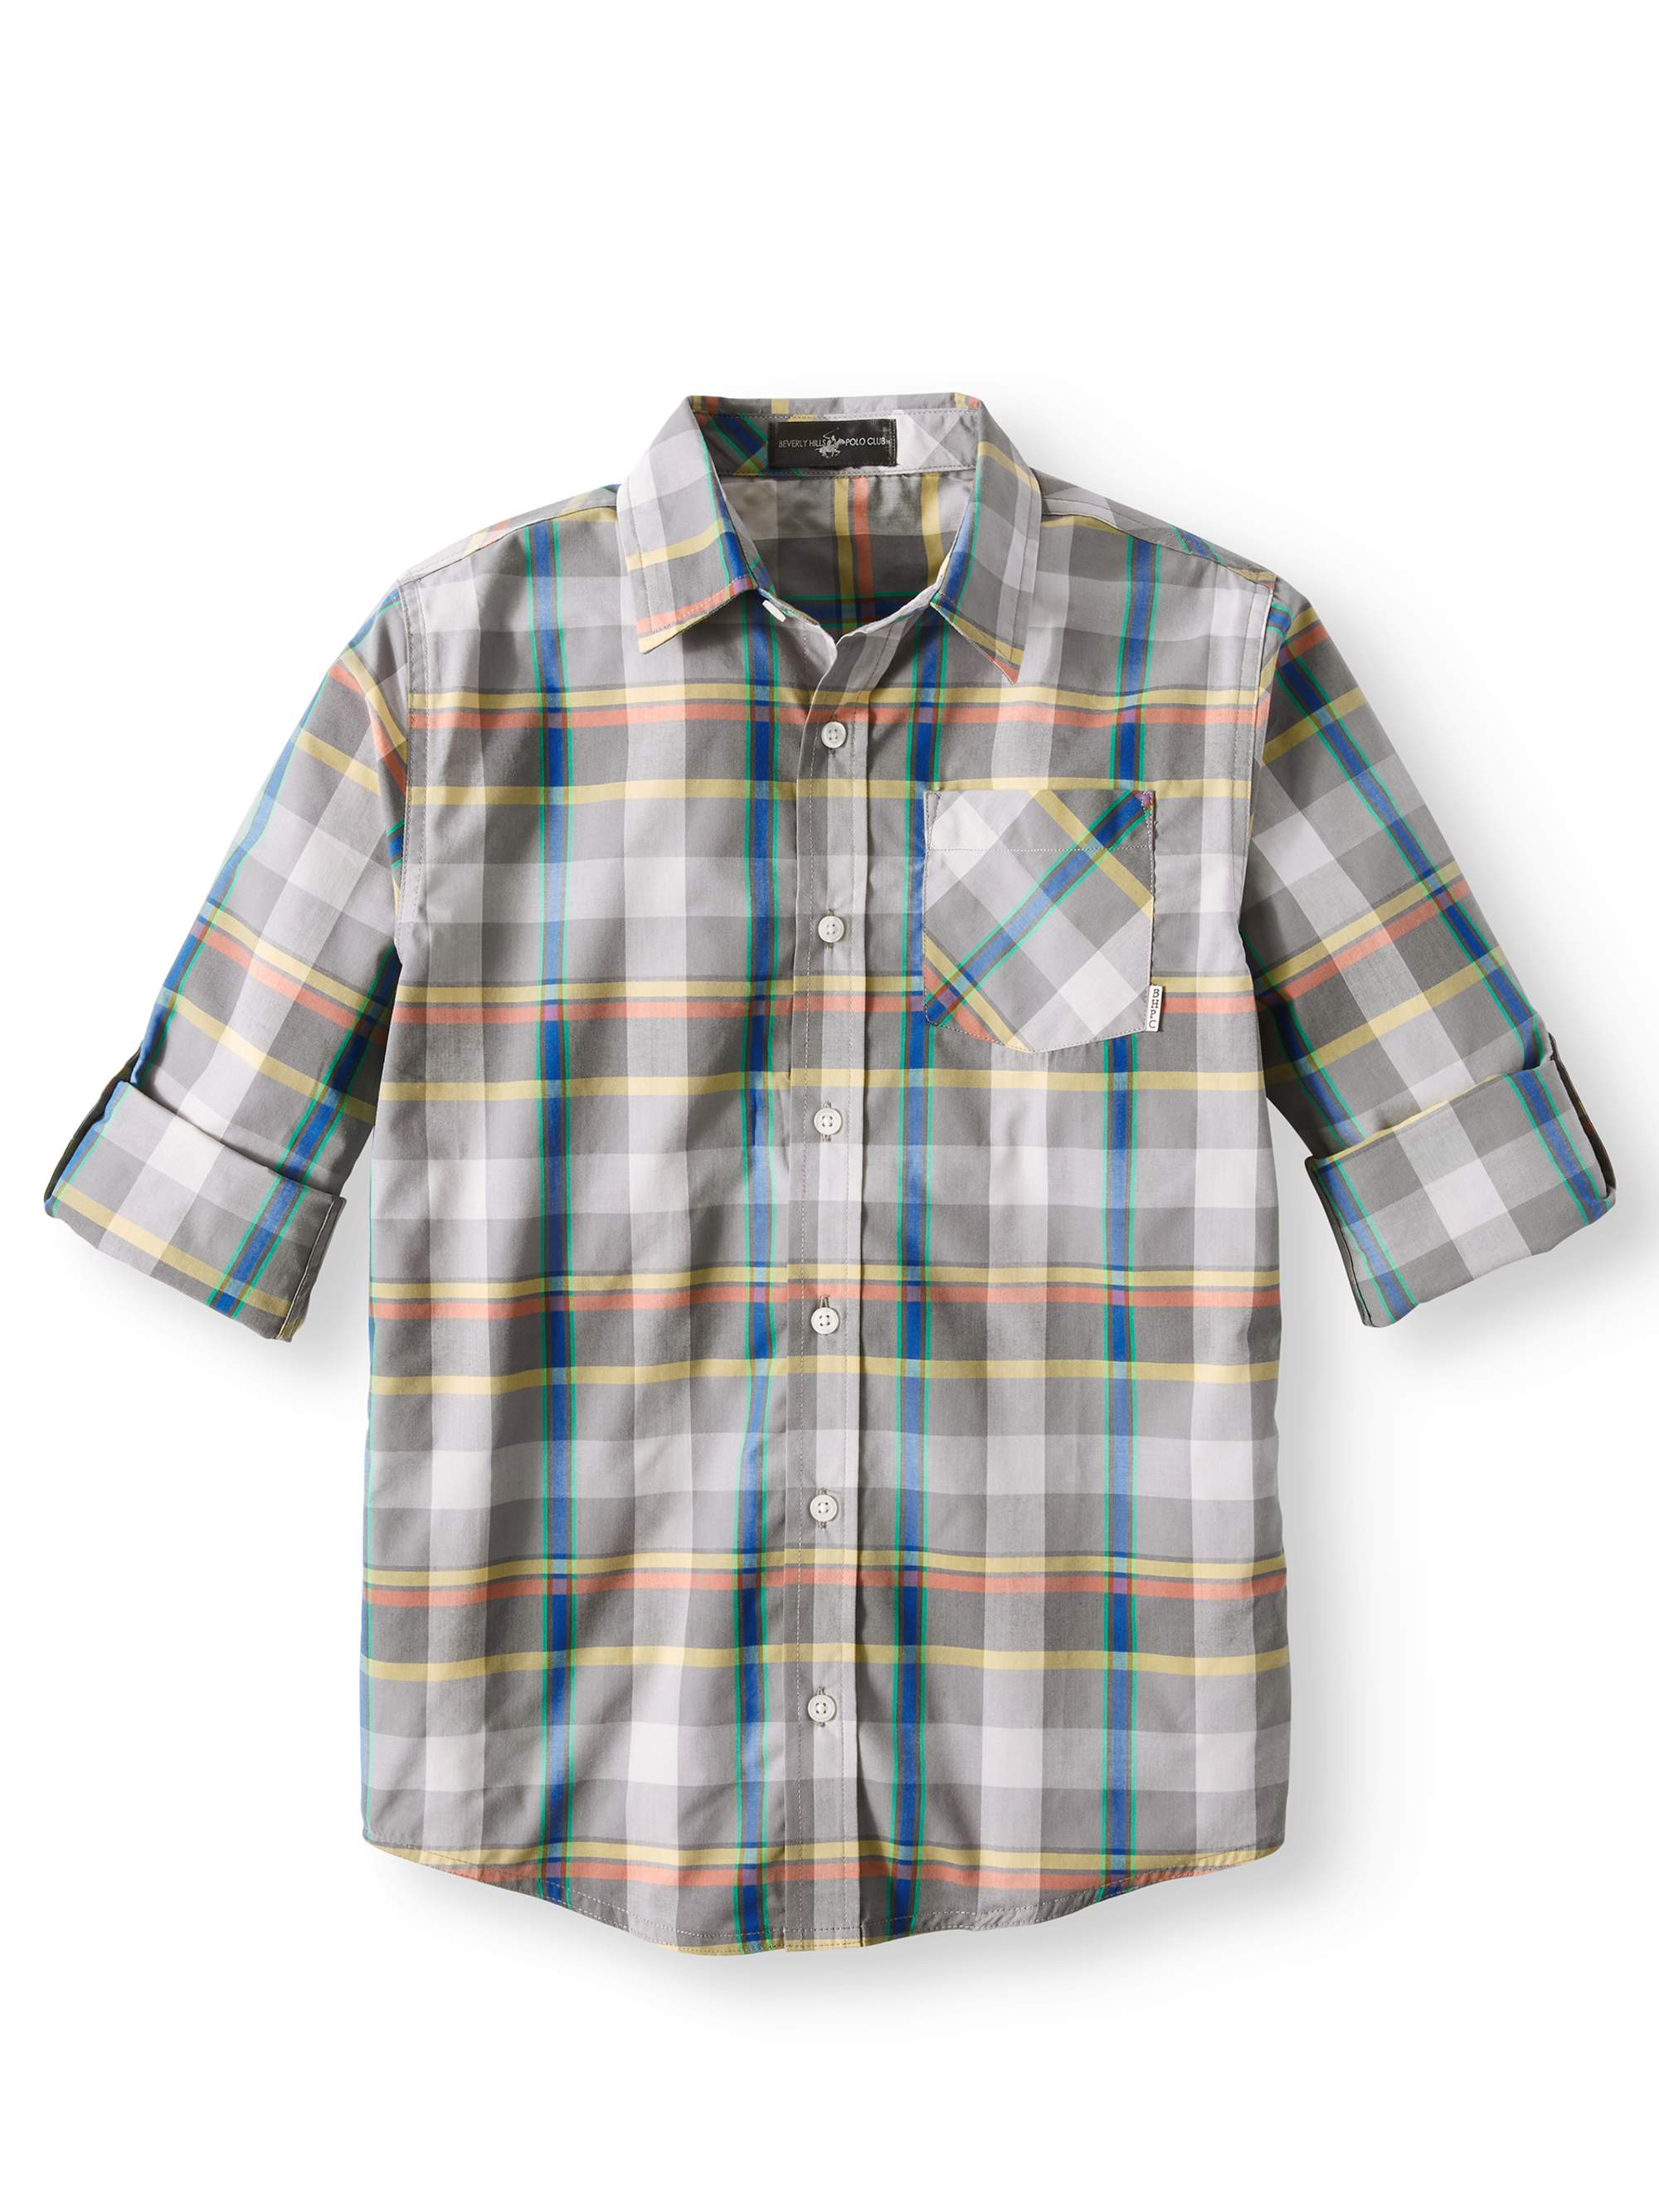 Beverly Hills Polo Club Plaid Long Sleeve Woven Shirt (Big Boys)